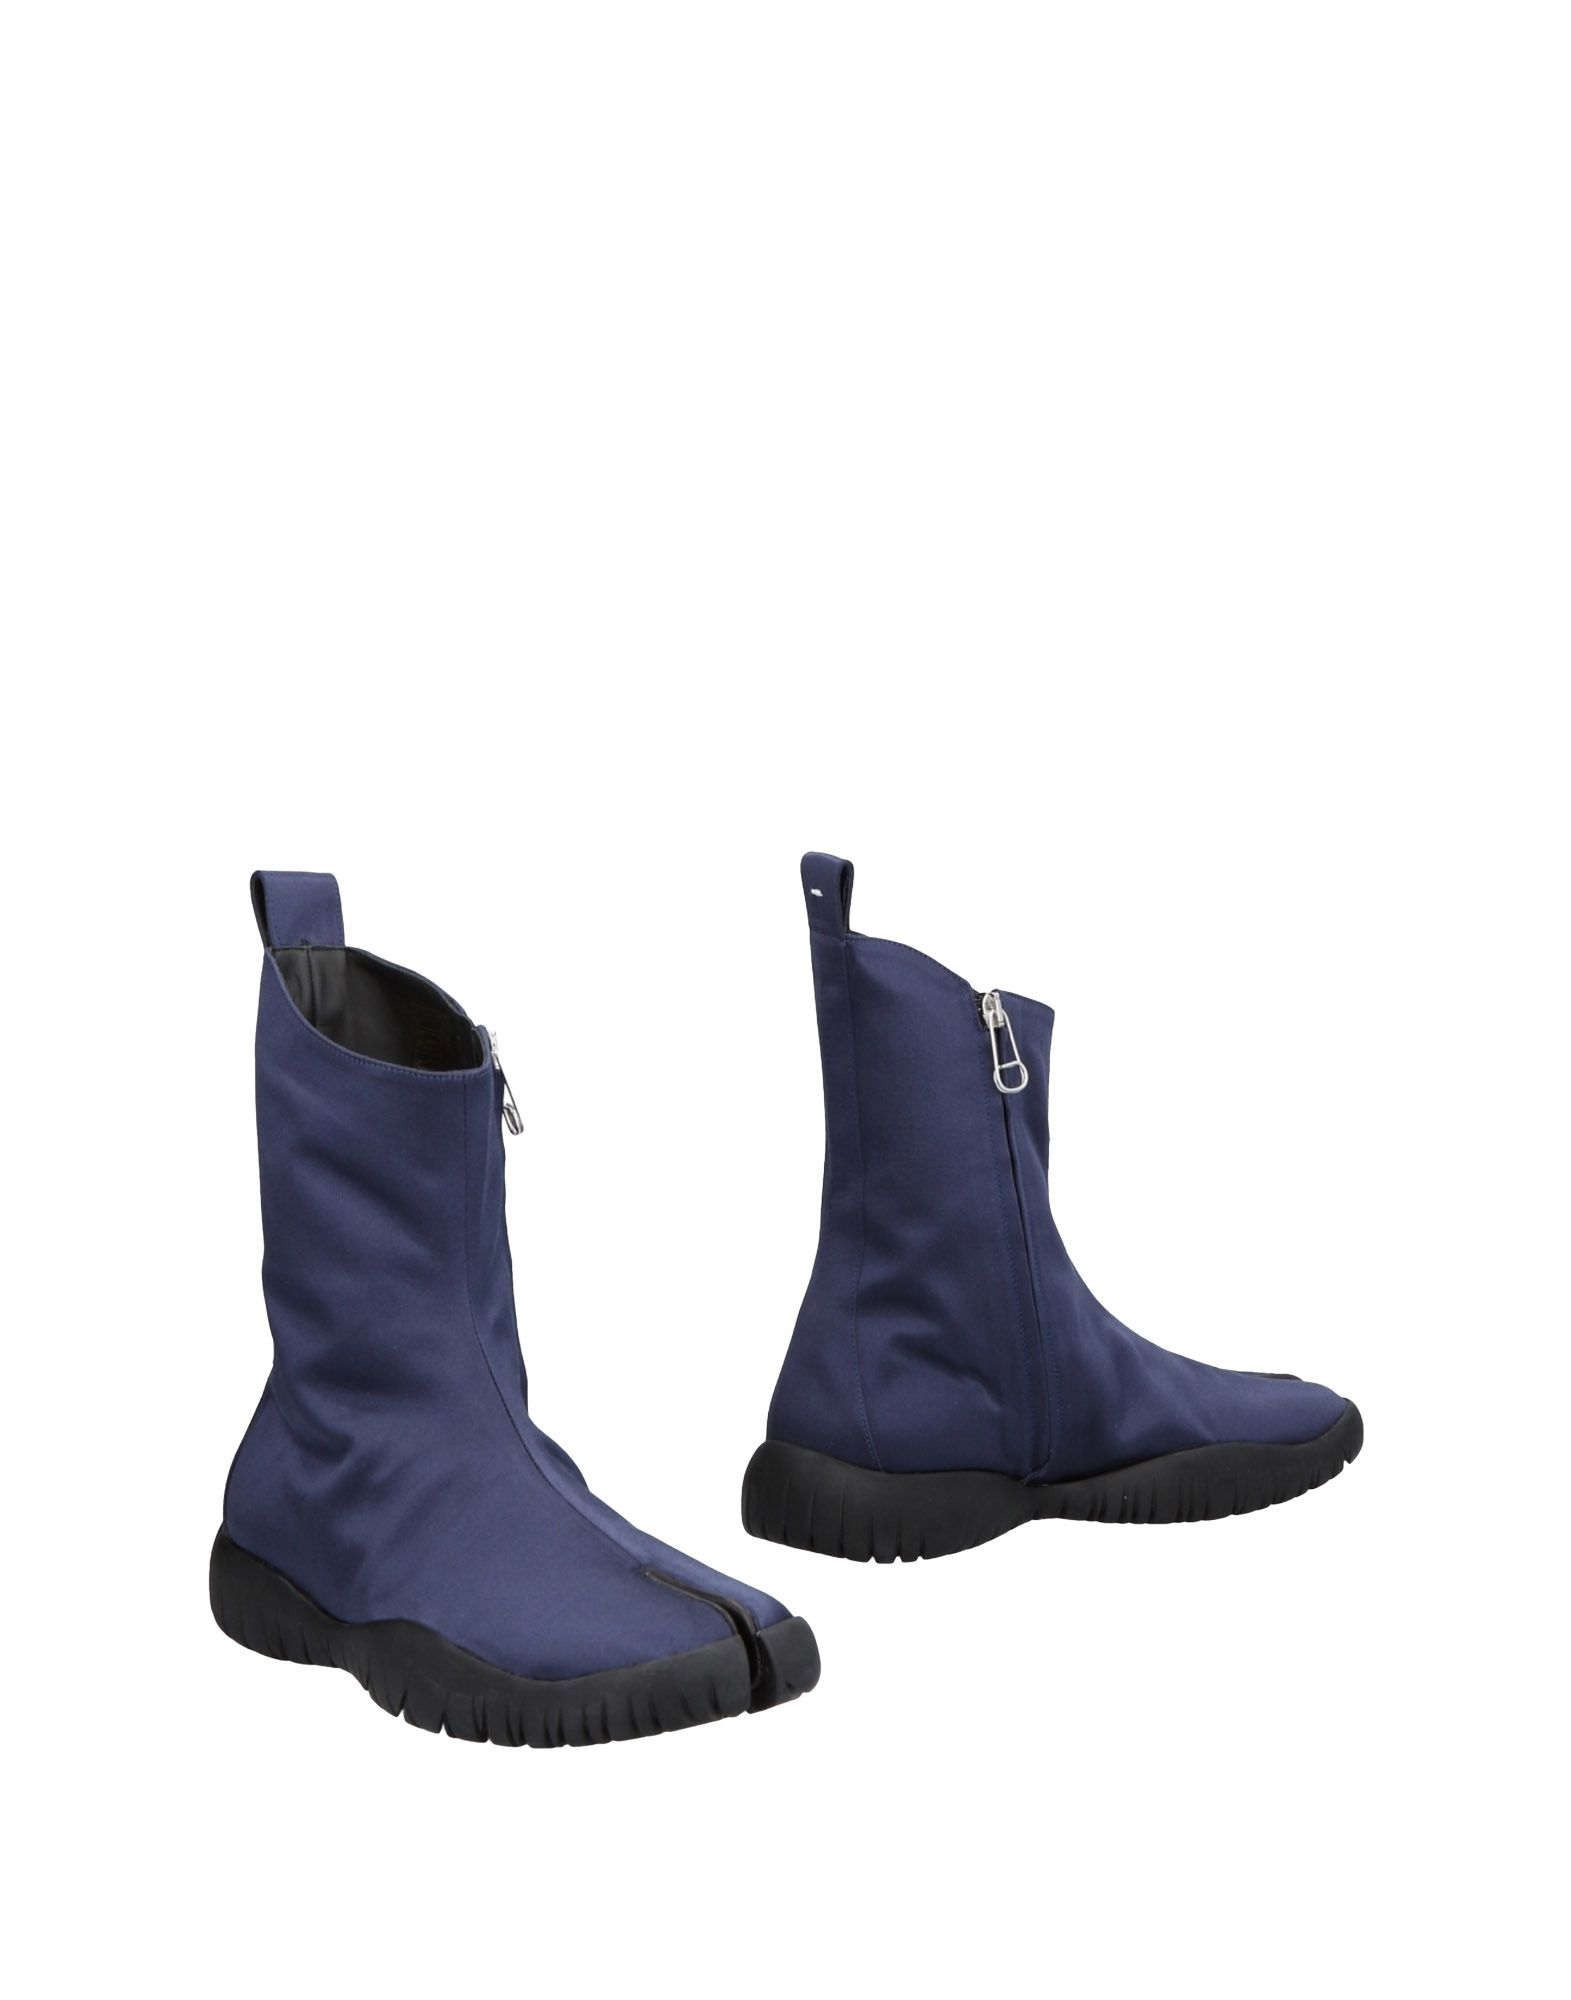 Maison Margiela Stiefelette Damen  Schuhe 11470025GC Neue Schuhe  2c93dd